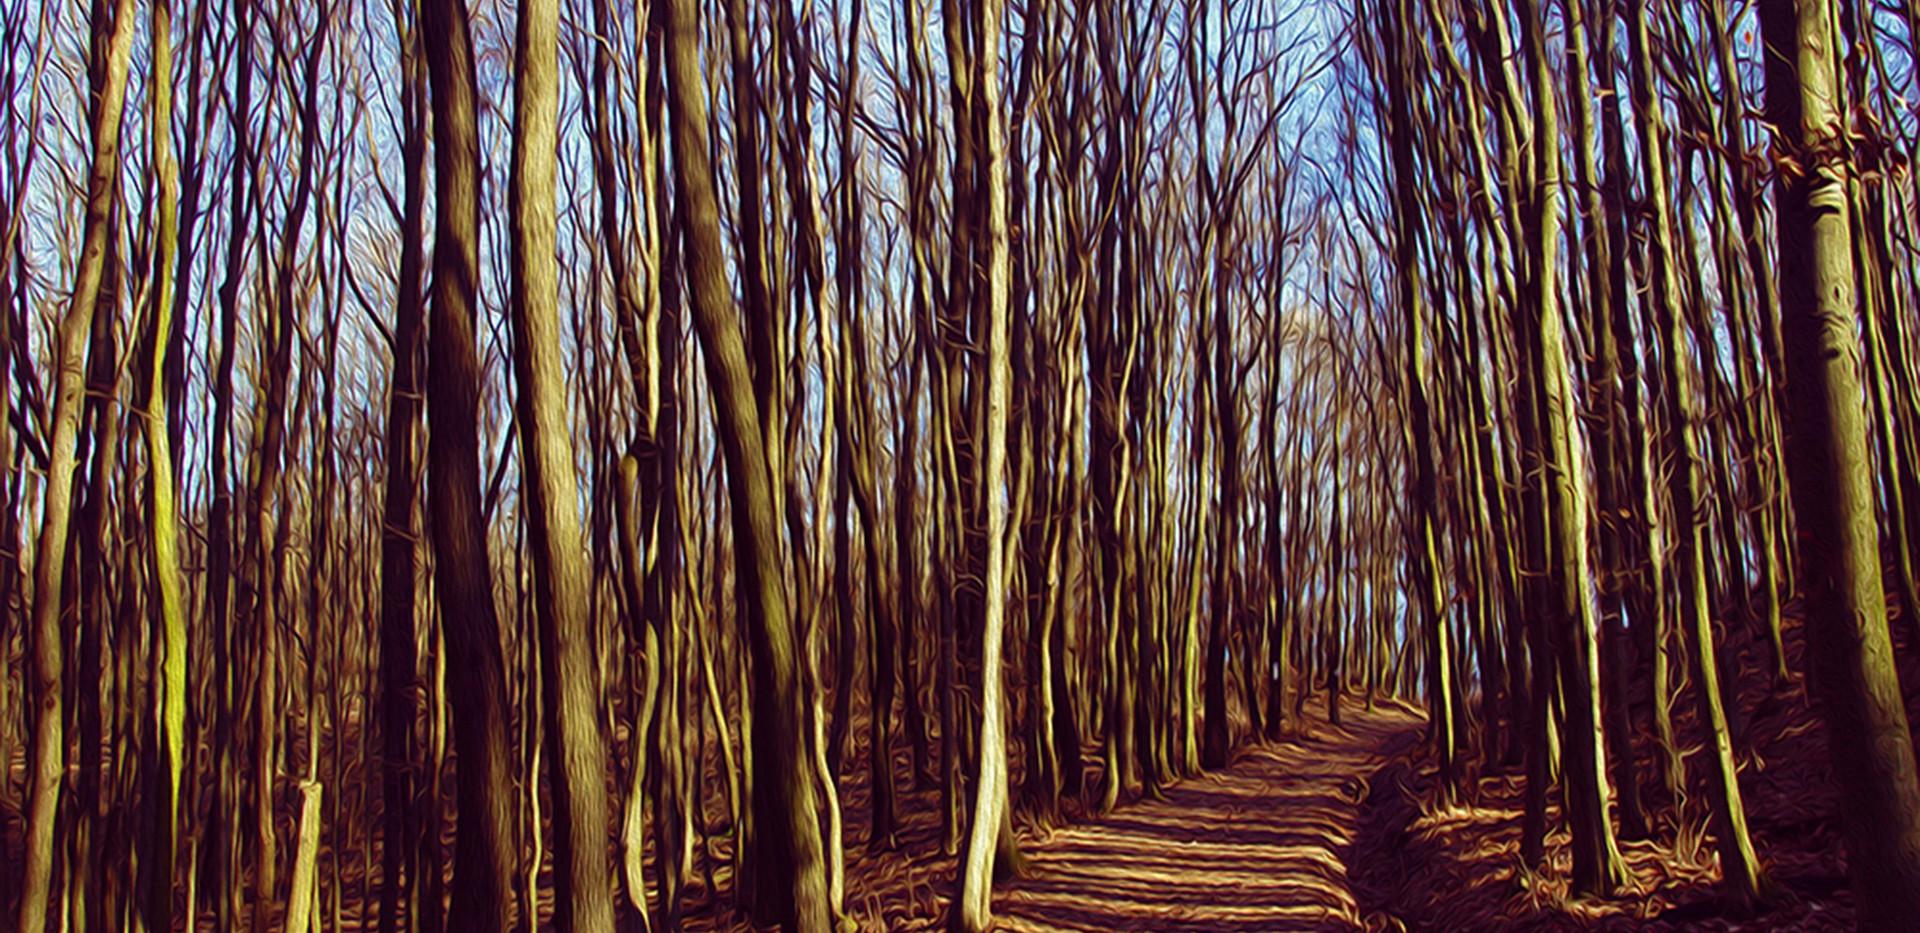 KRISTIN INBAL, In the Woods